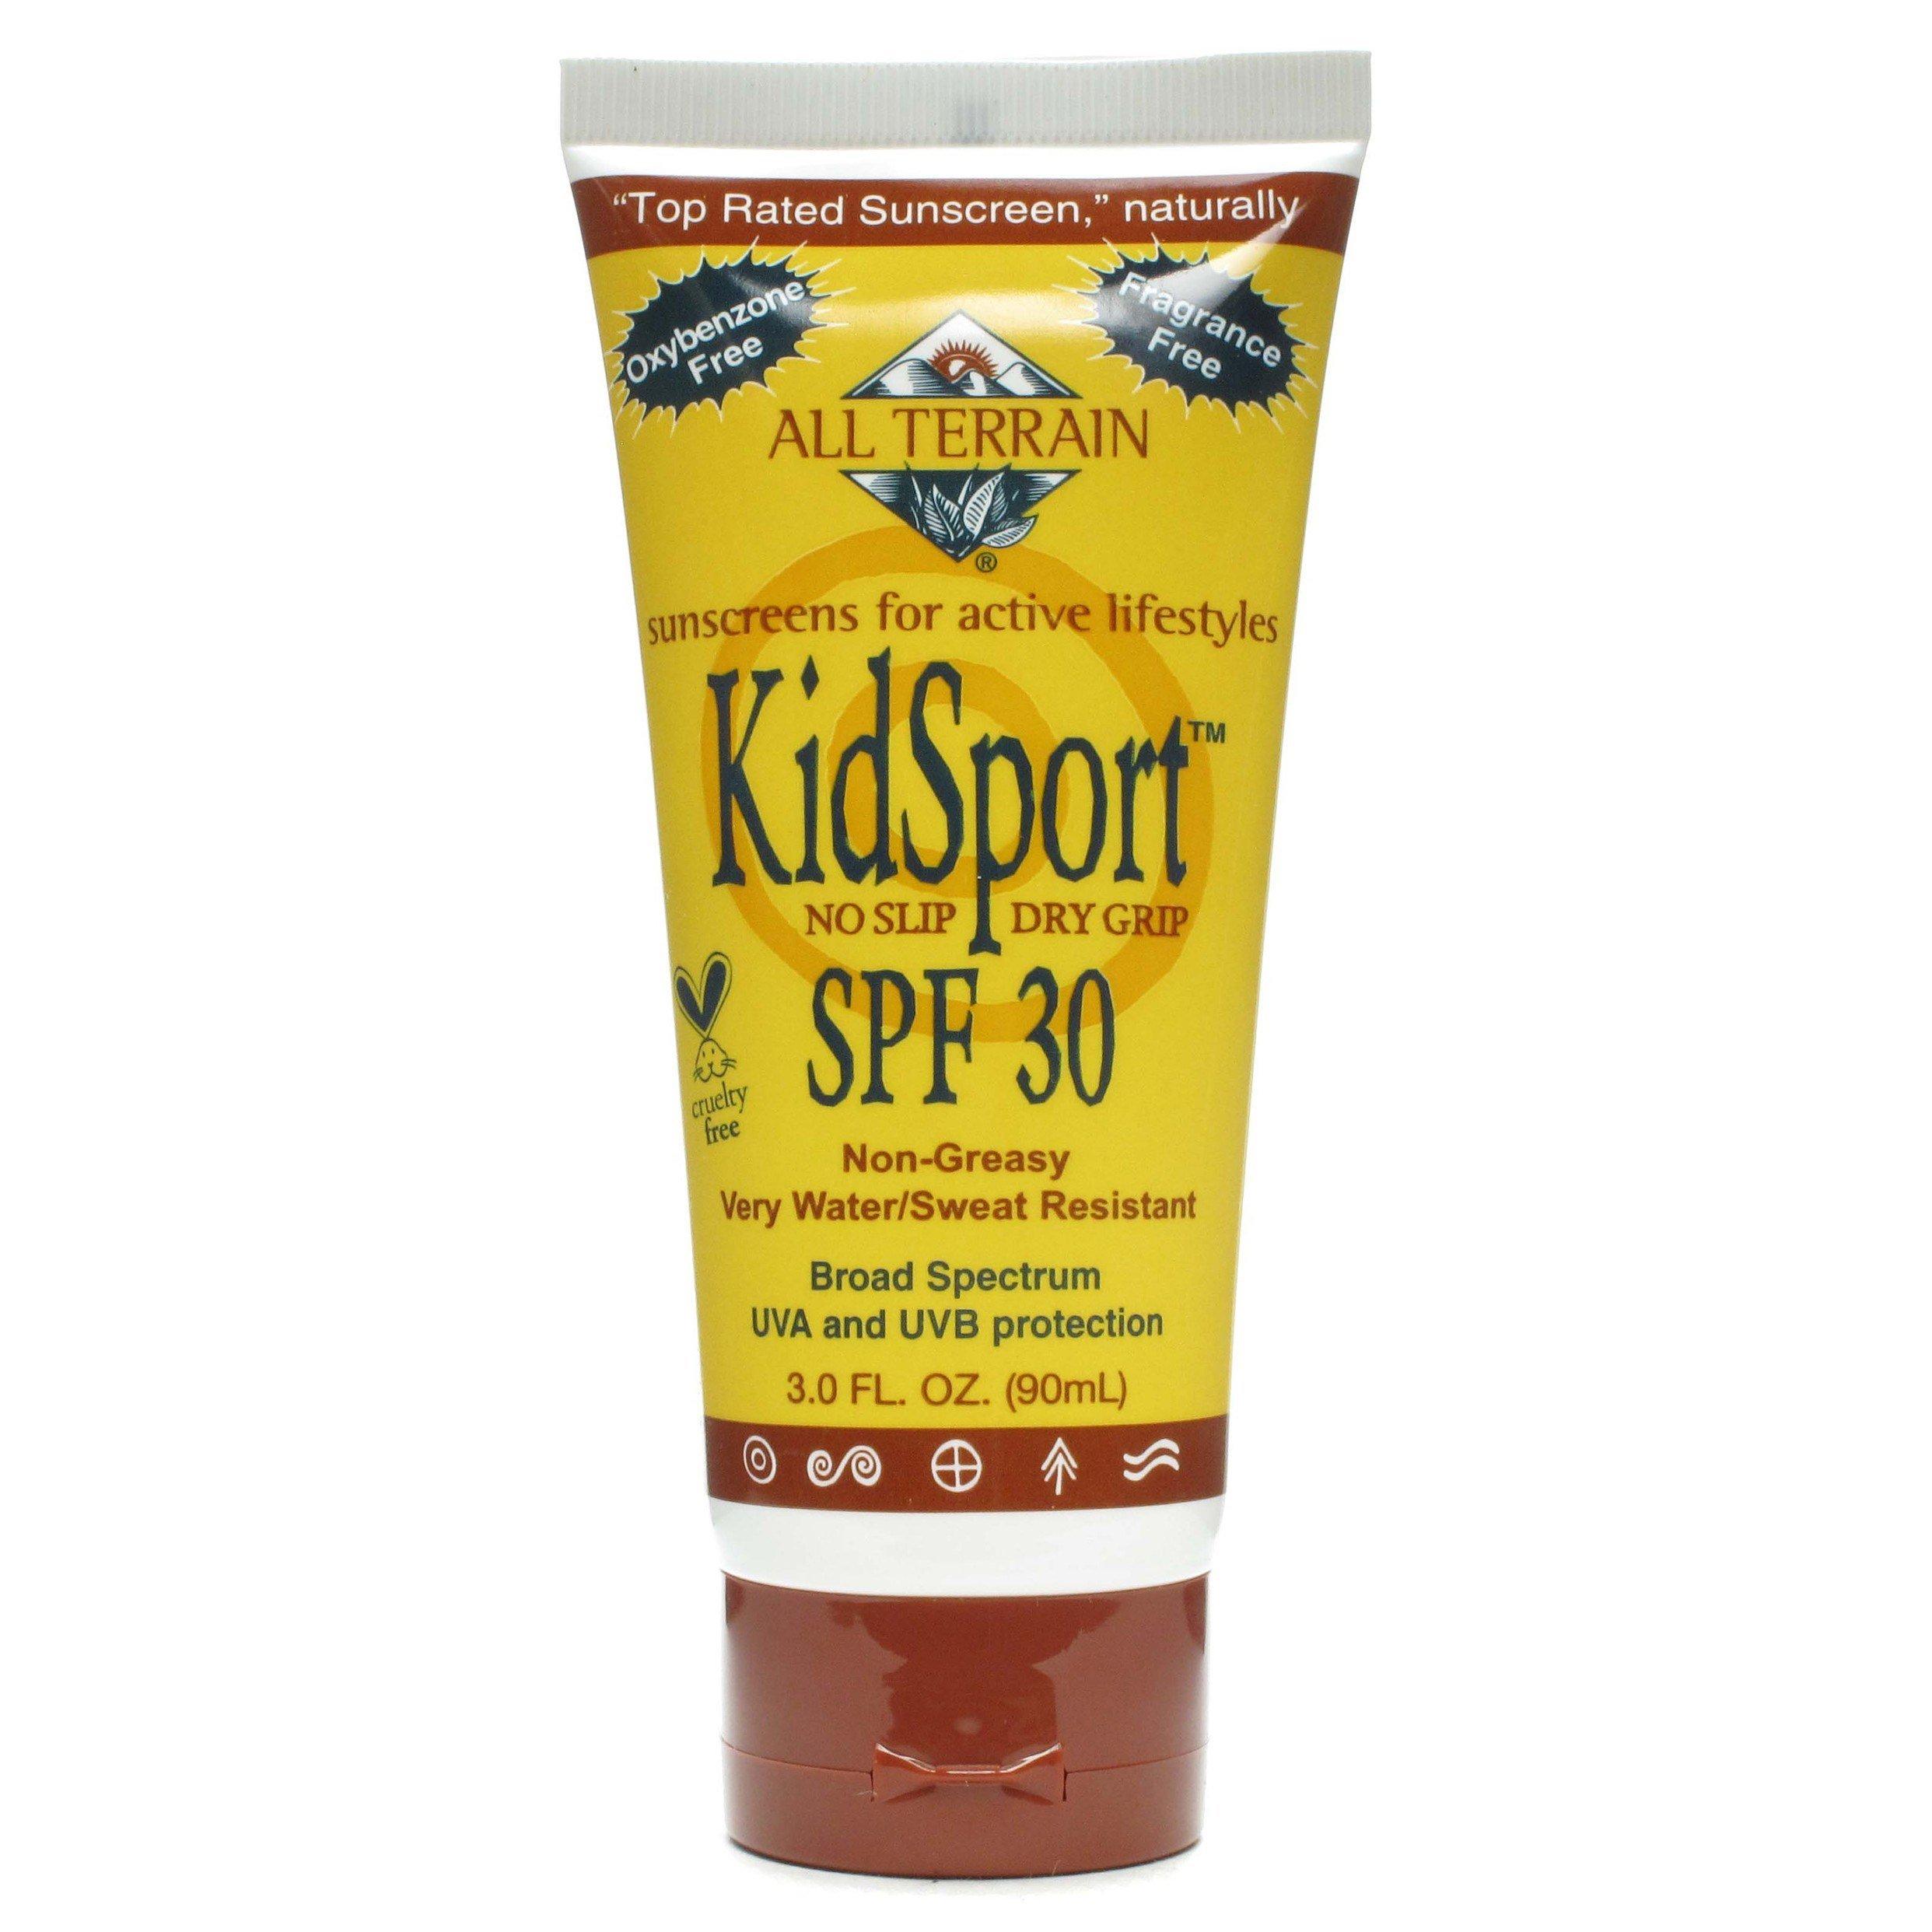 All Terrain Kidsport Spf 30+ 3 Fz